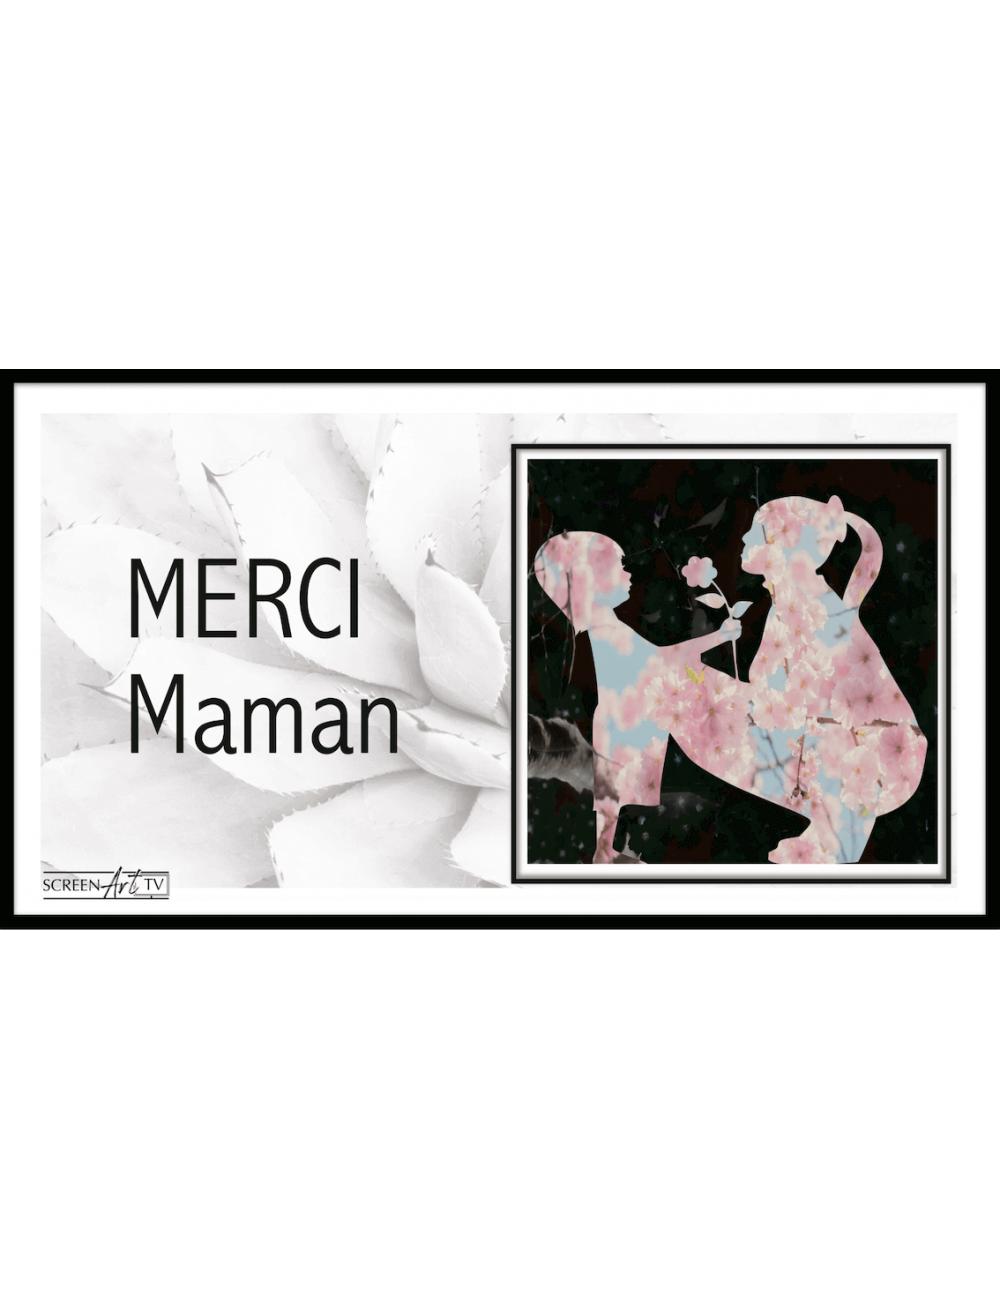 135 1-MERCI MAMAN